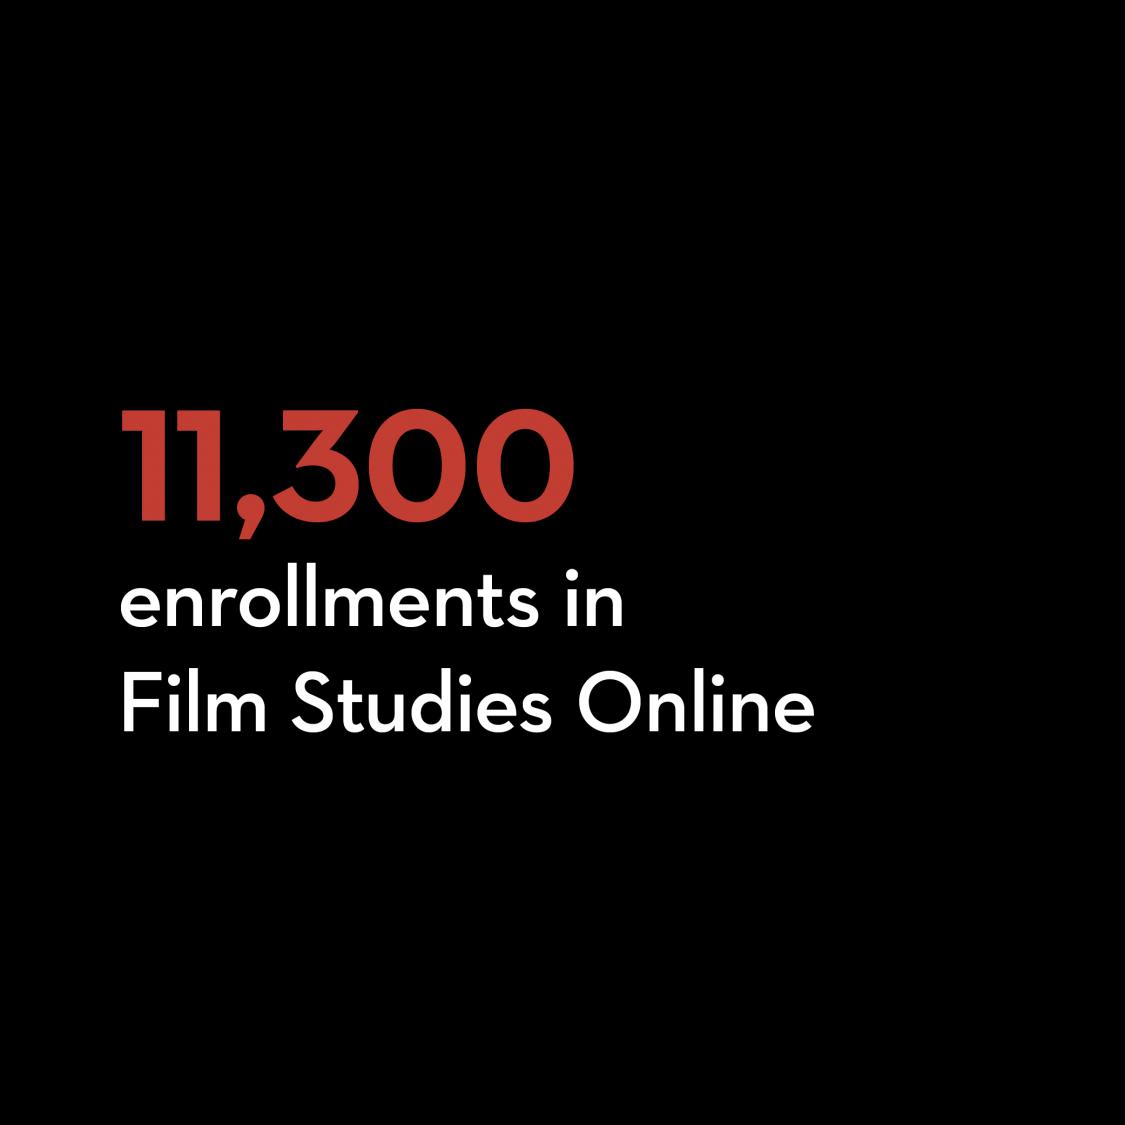 11,300 enrollments in Film Studies Online